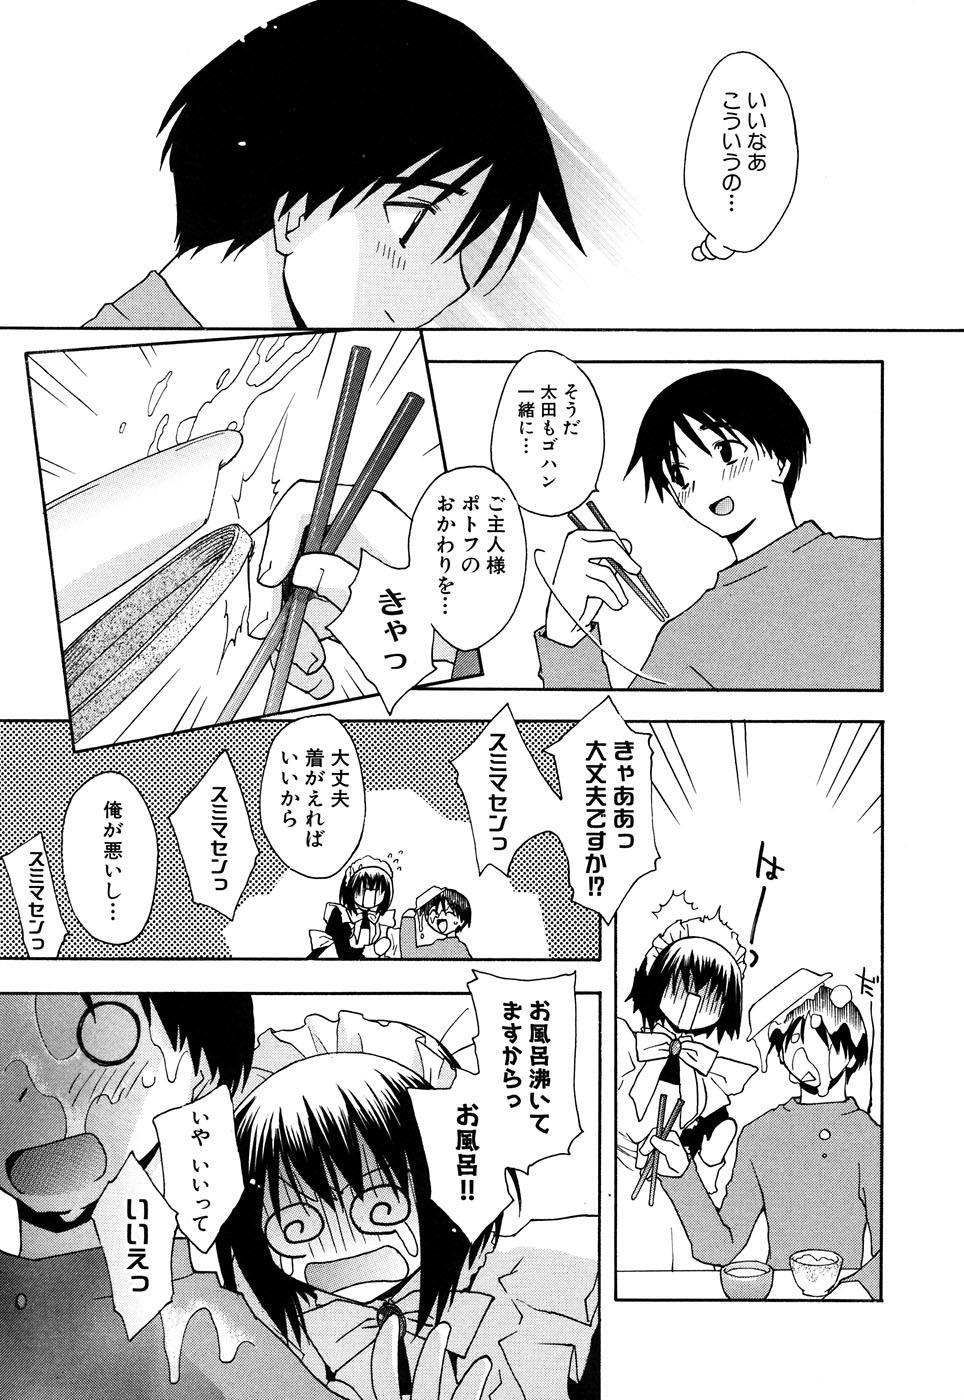 Fechikko VS Series ROUND.2 Miko San VS Maid San 93